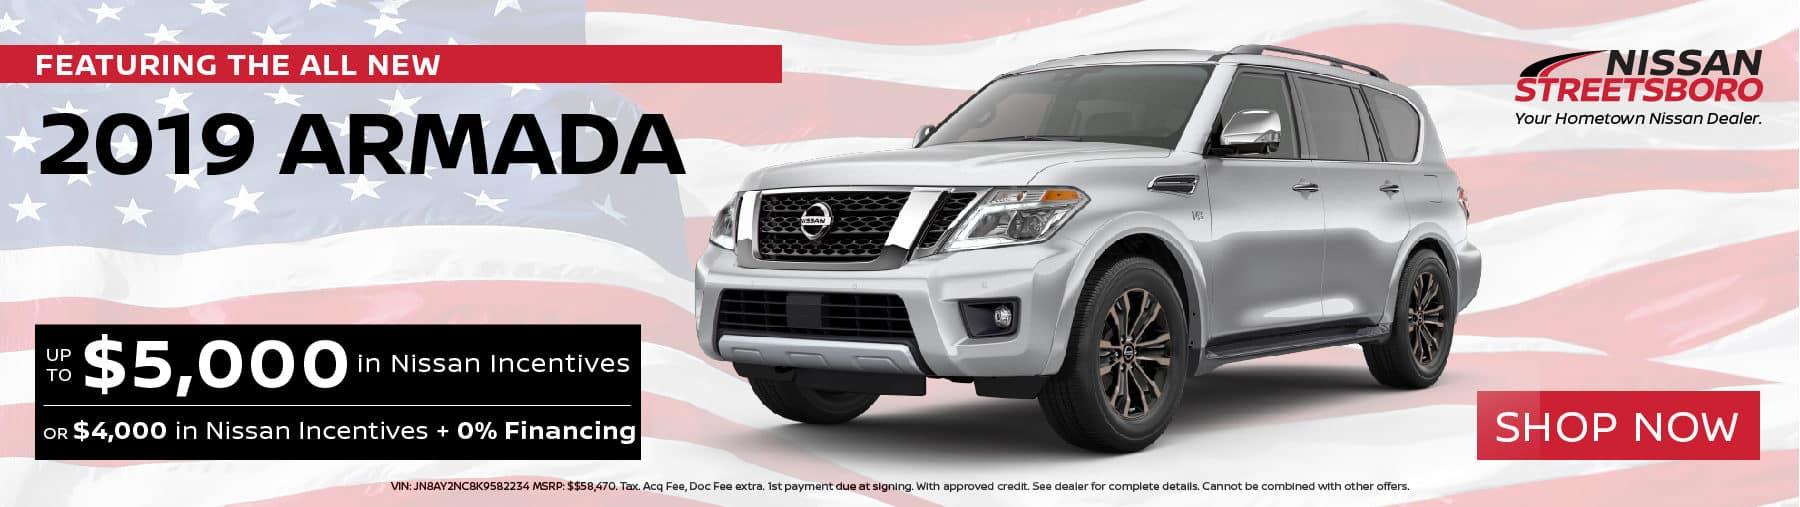 2019 Nissan Armada Incentives